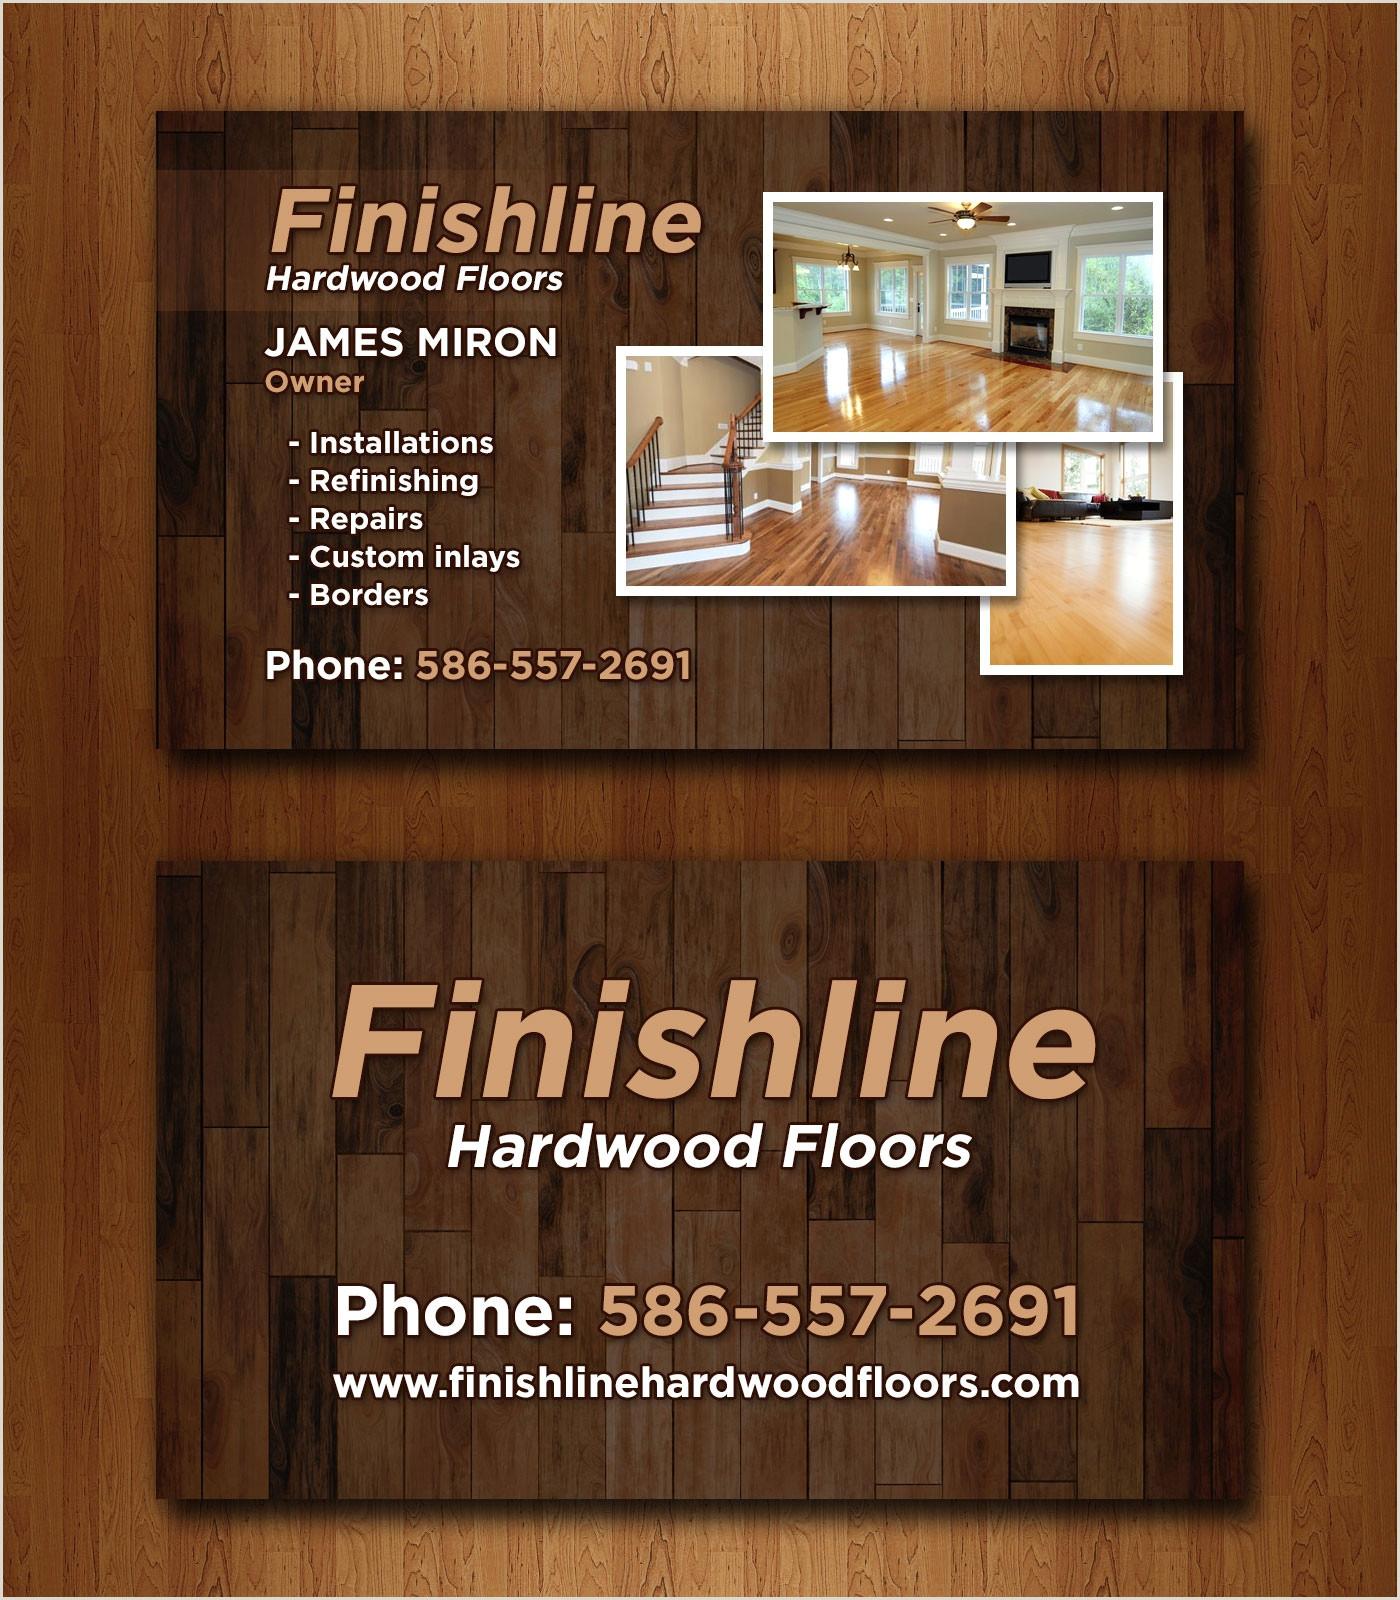 Design Unique Business Cards In Photoshop 14 Popular Hardwood Flooring Business Card Template